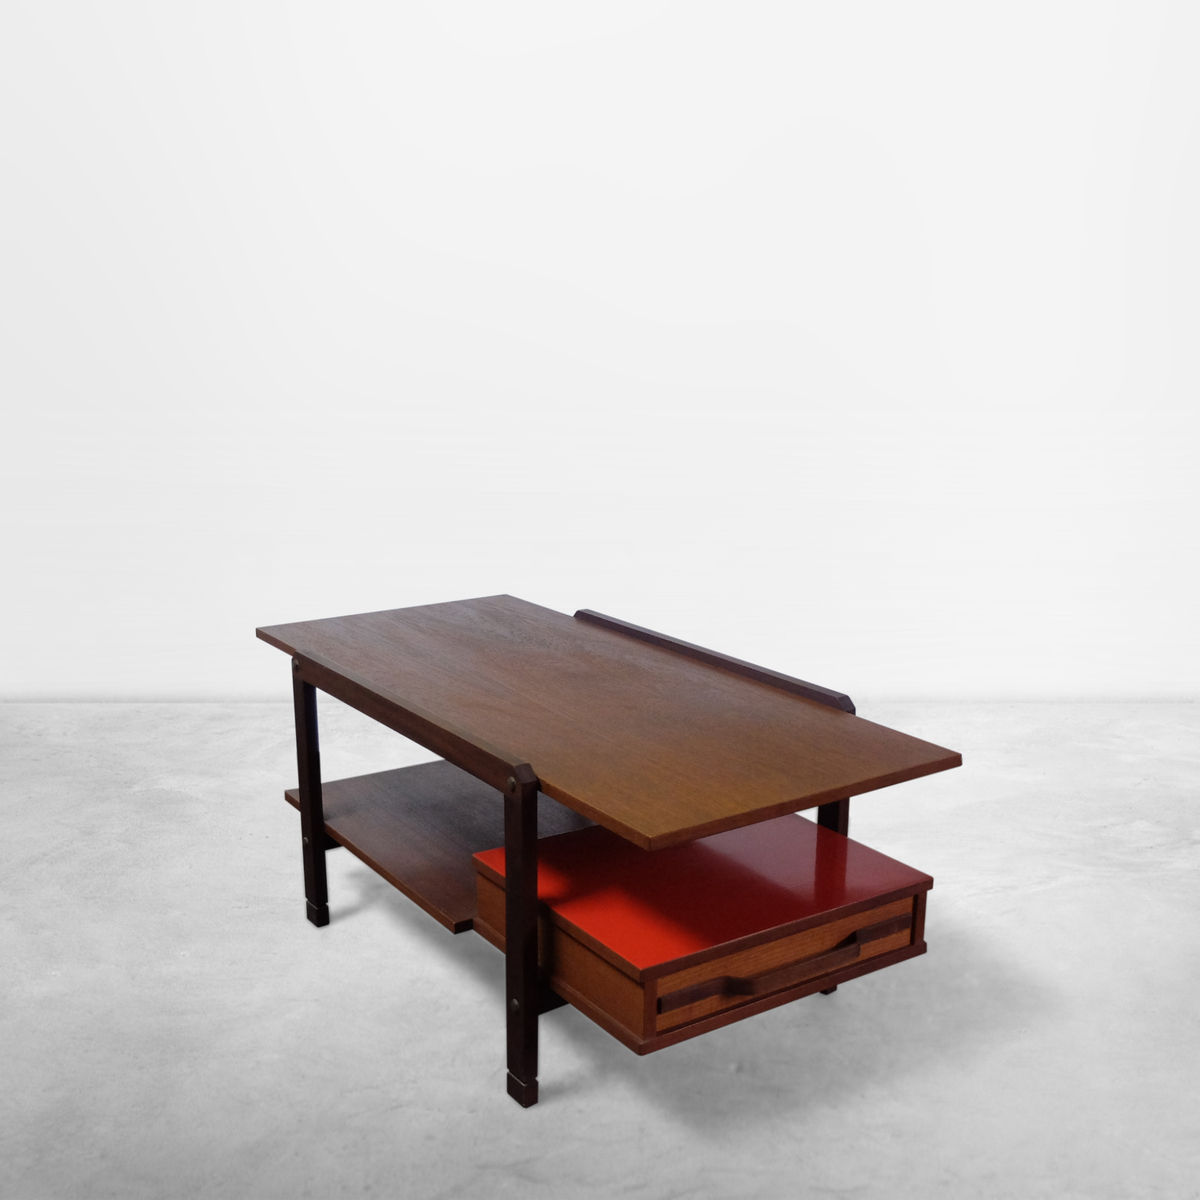 Italian Mid-Century Modern Rationalist Coffee Table, 1950s